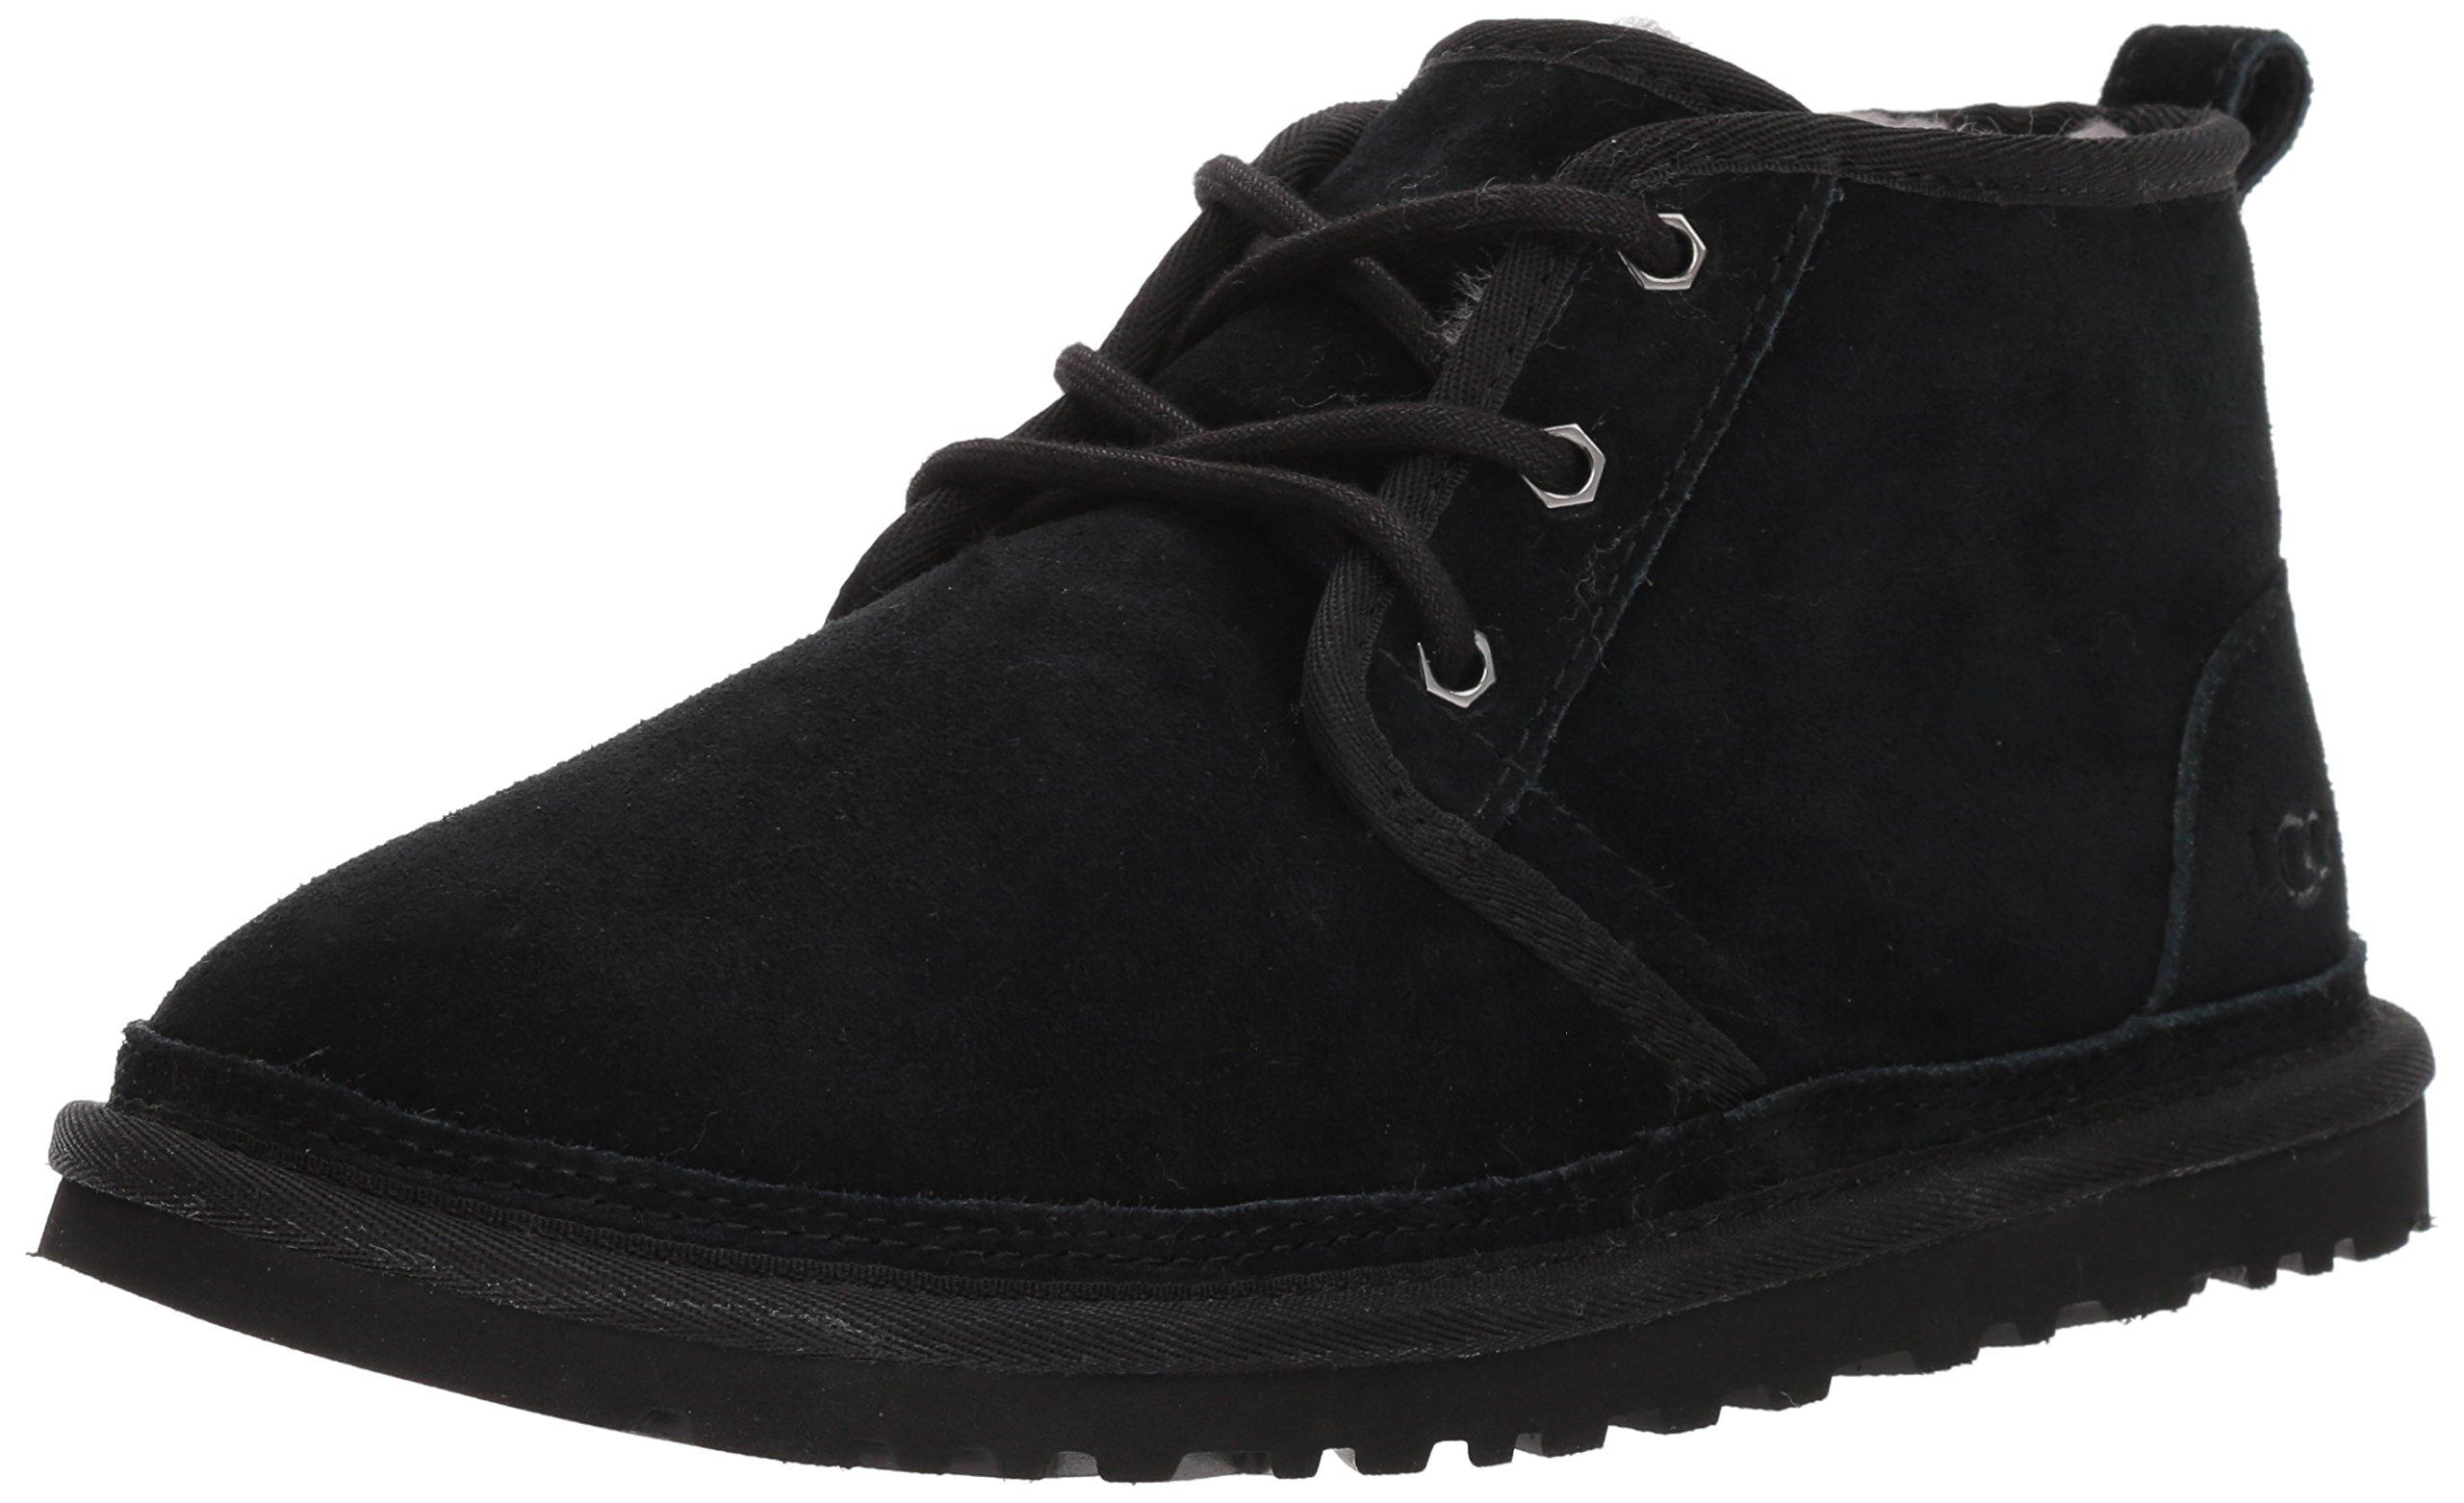 UGG Men's Neumel Chukka Boot, Black, 5 M US